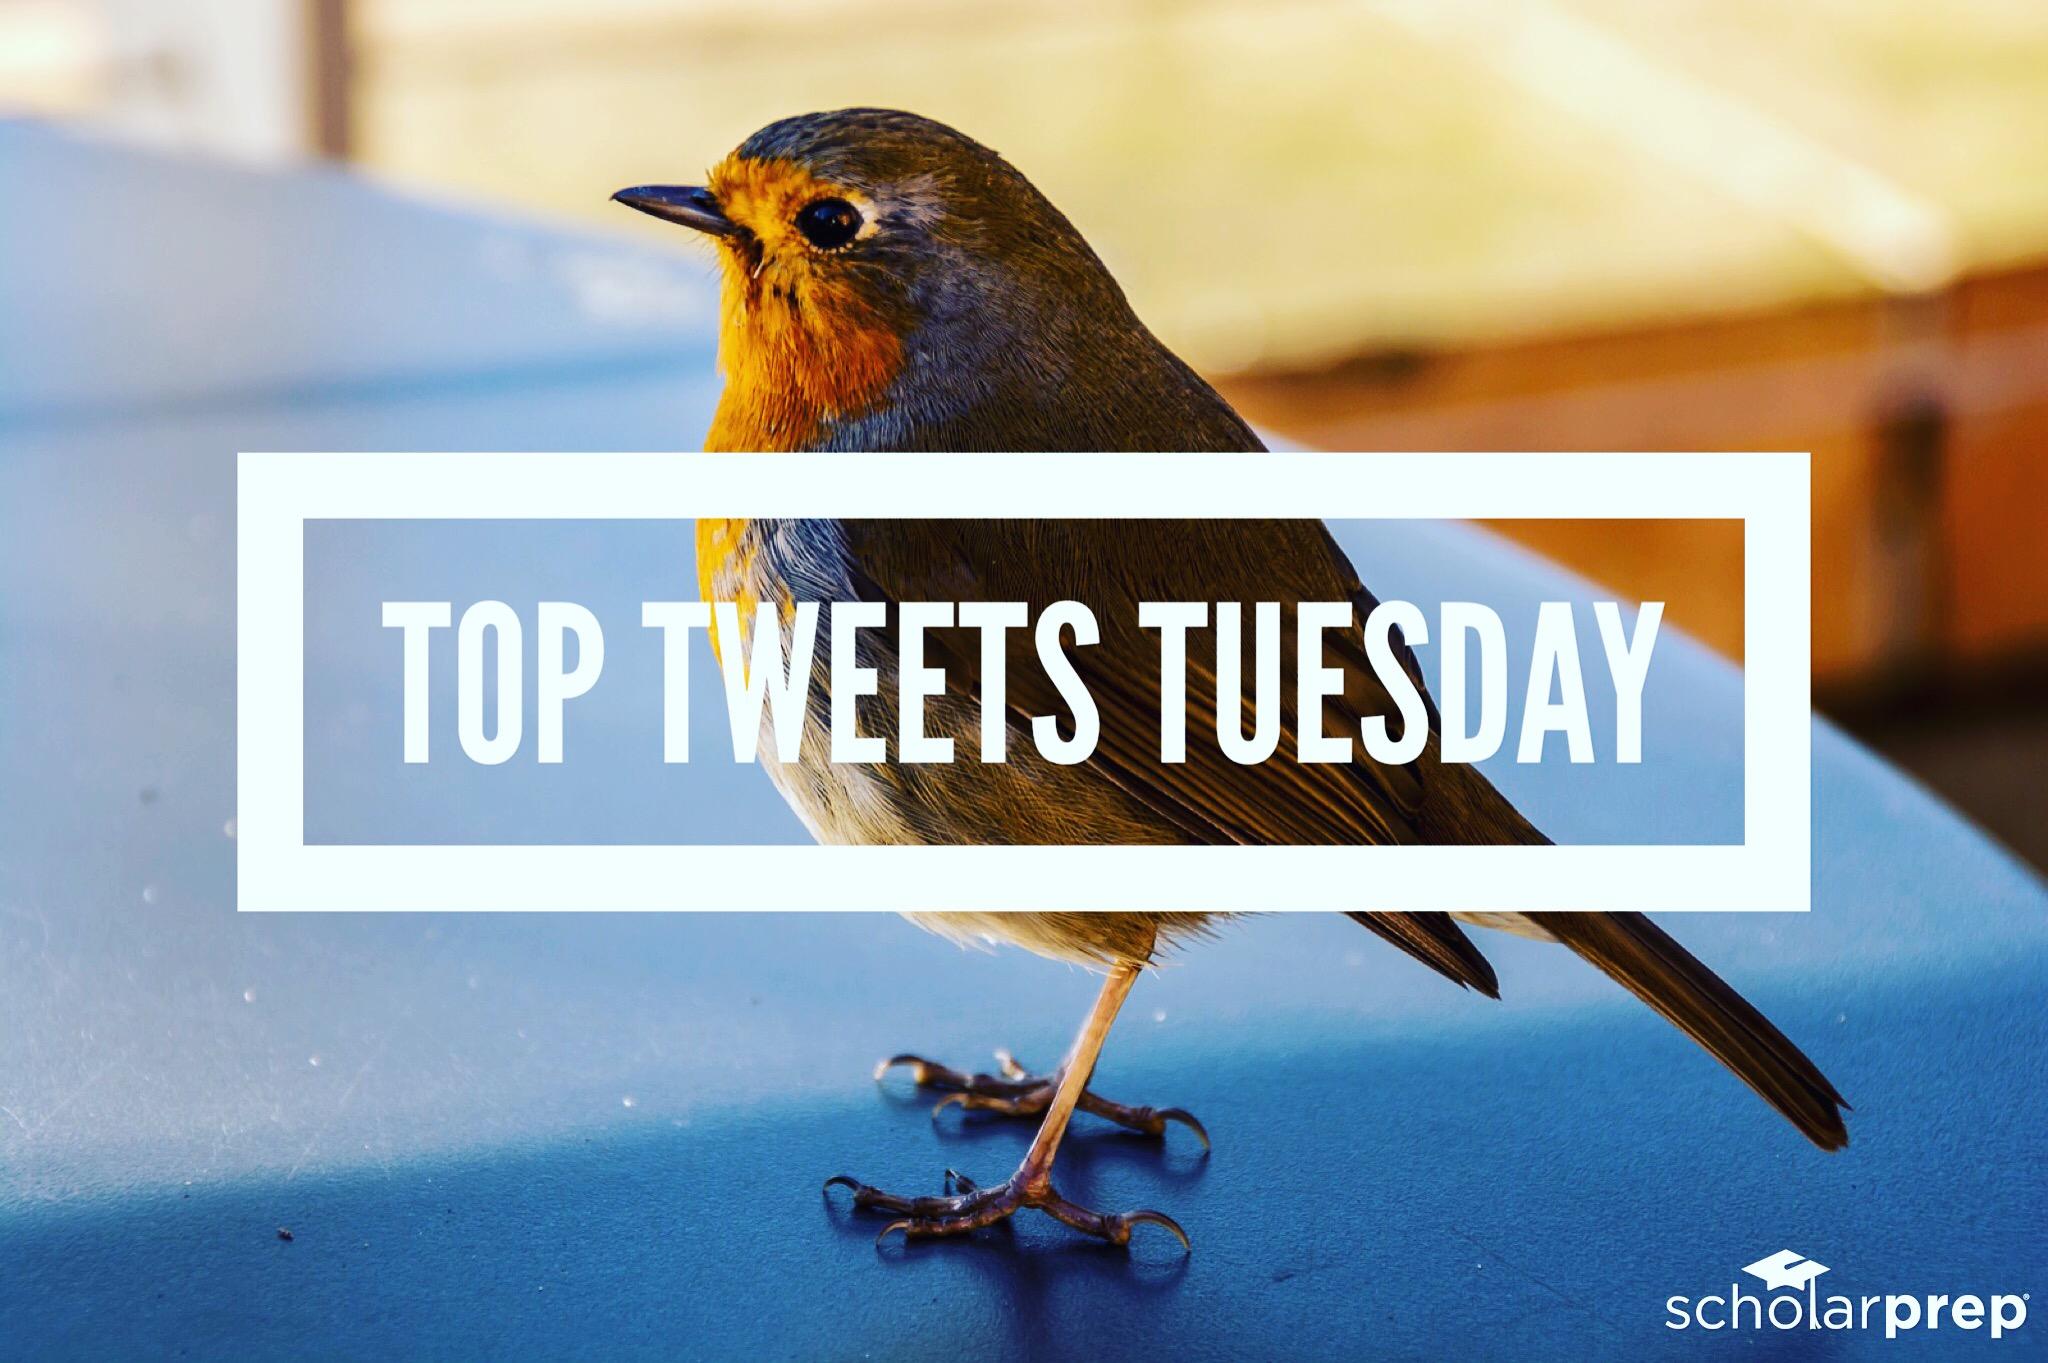 Top Tweets Tuesday